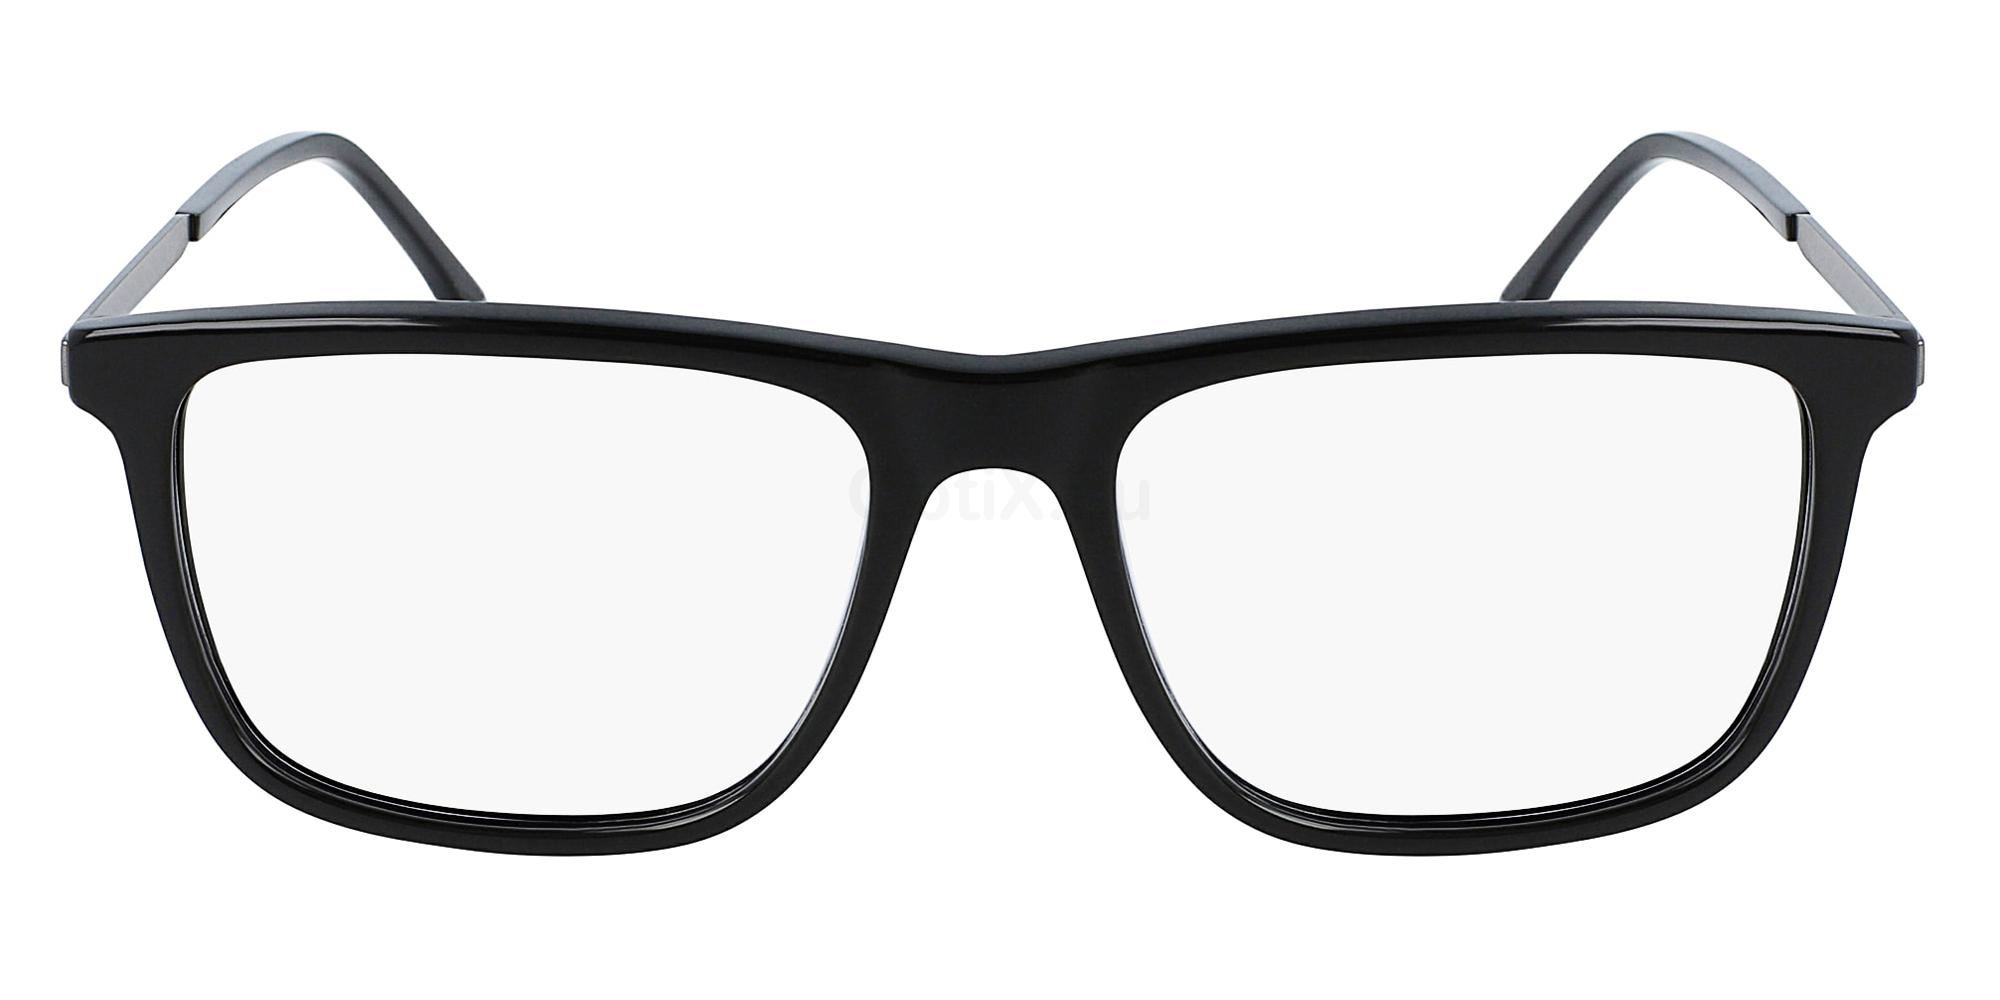 001 L2871 Glasses, Lacoste